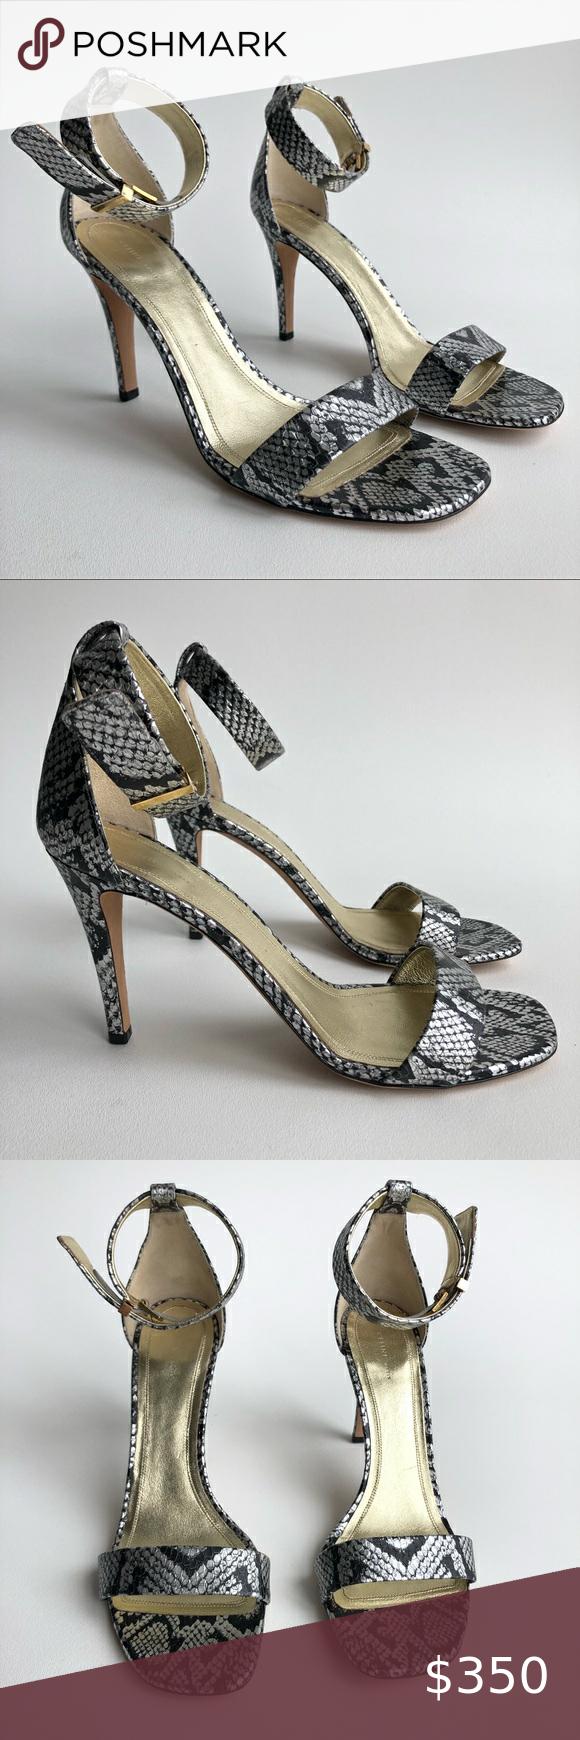 Celine Python Snakeskin Iconic Silver Gold Heels In 2020 Gold Heels Gold Sandals Gold Sandals Heels